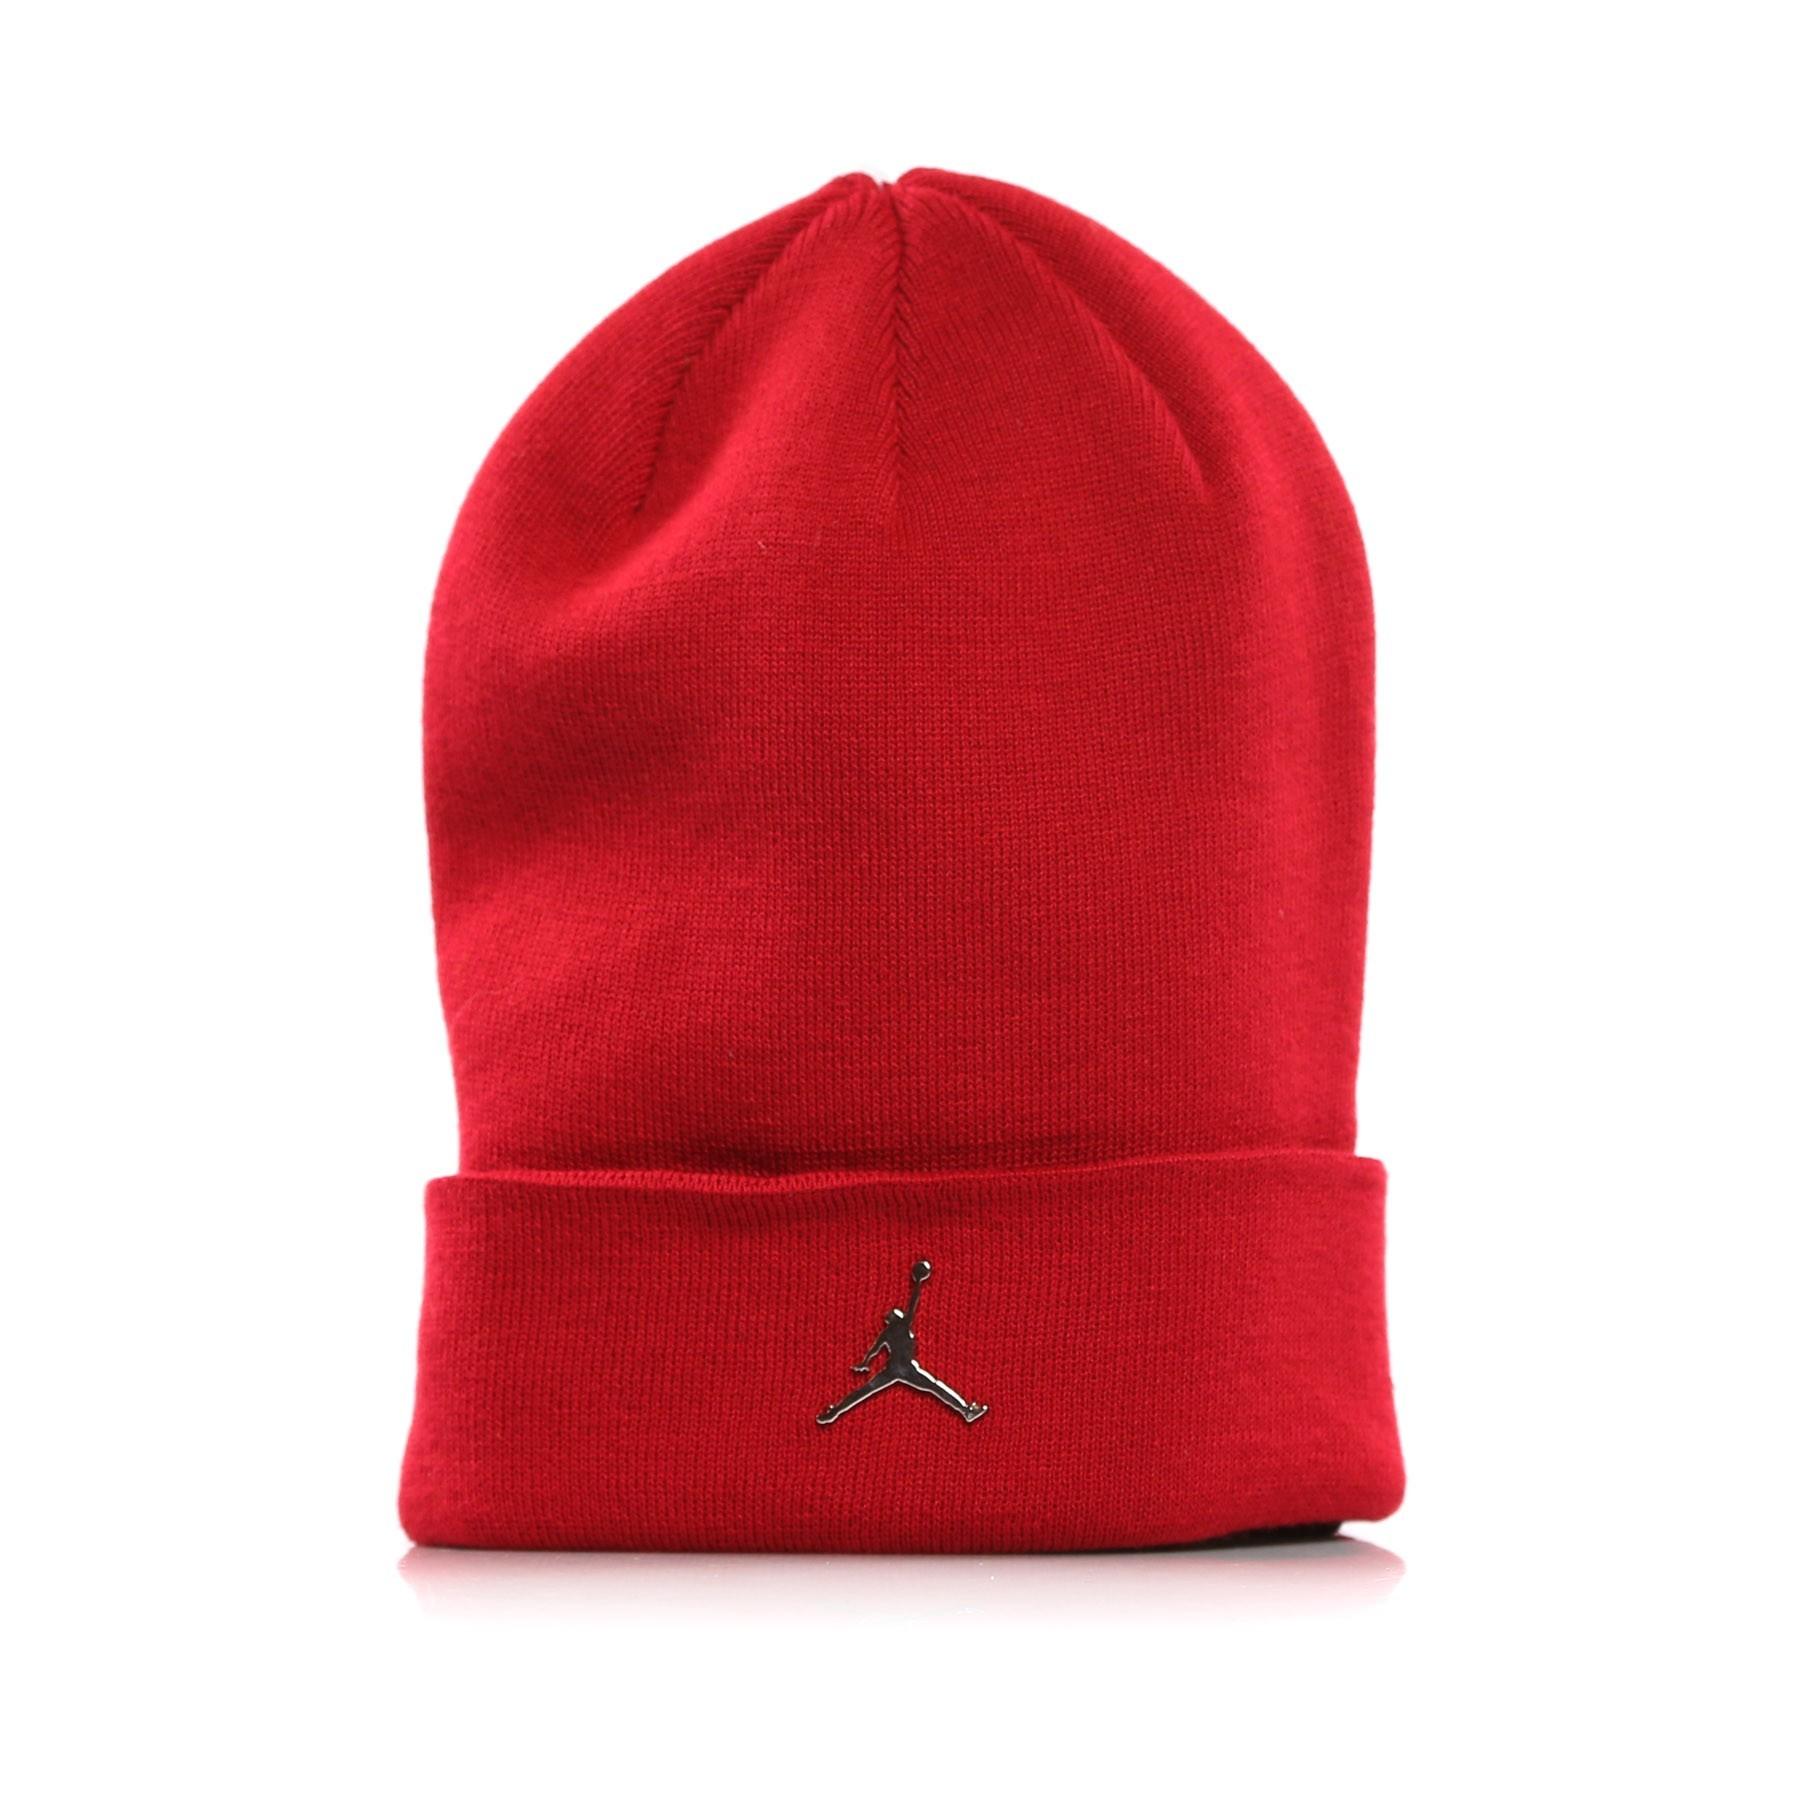 392b8815 ... reduced berretto lana jordan beanie cuffed gym red atipicishop b67dc  0dc0a